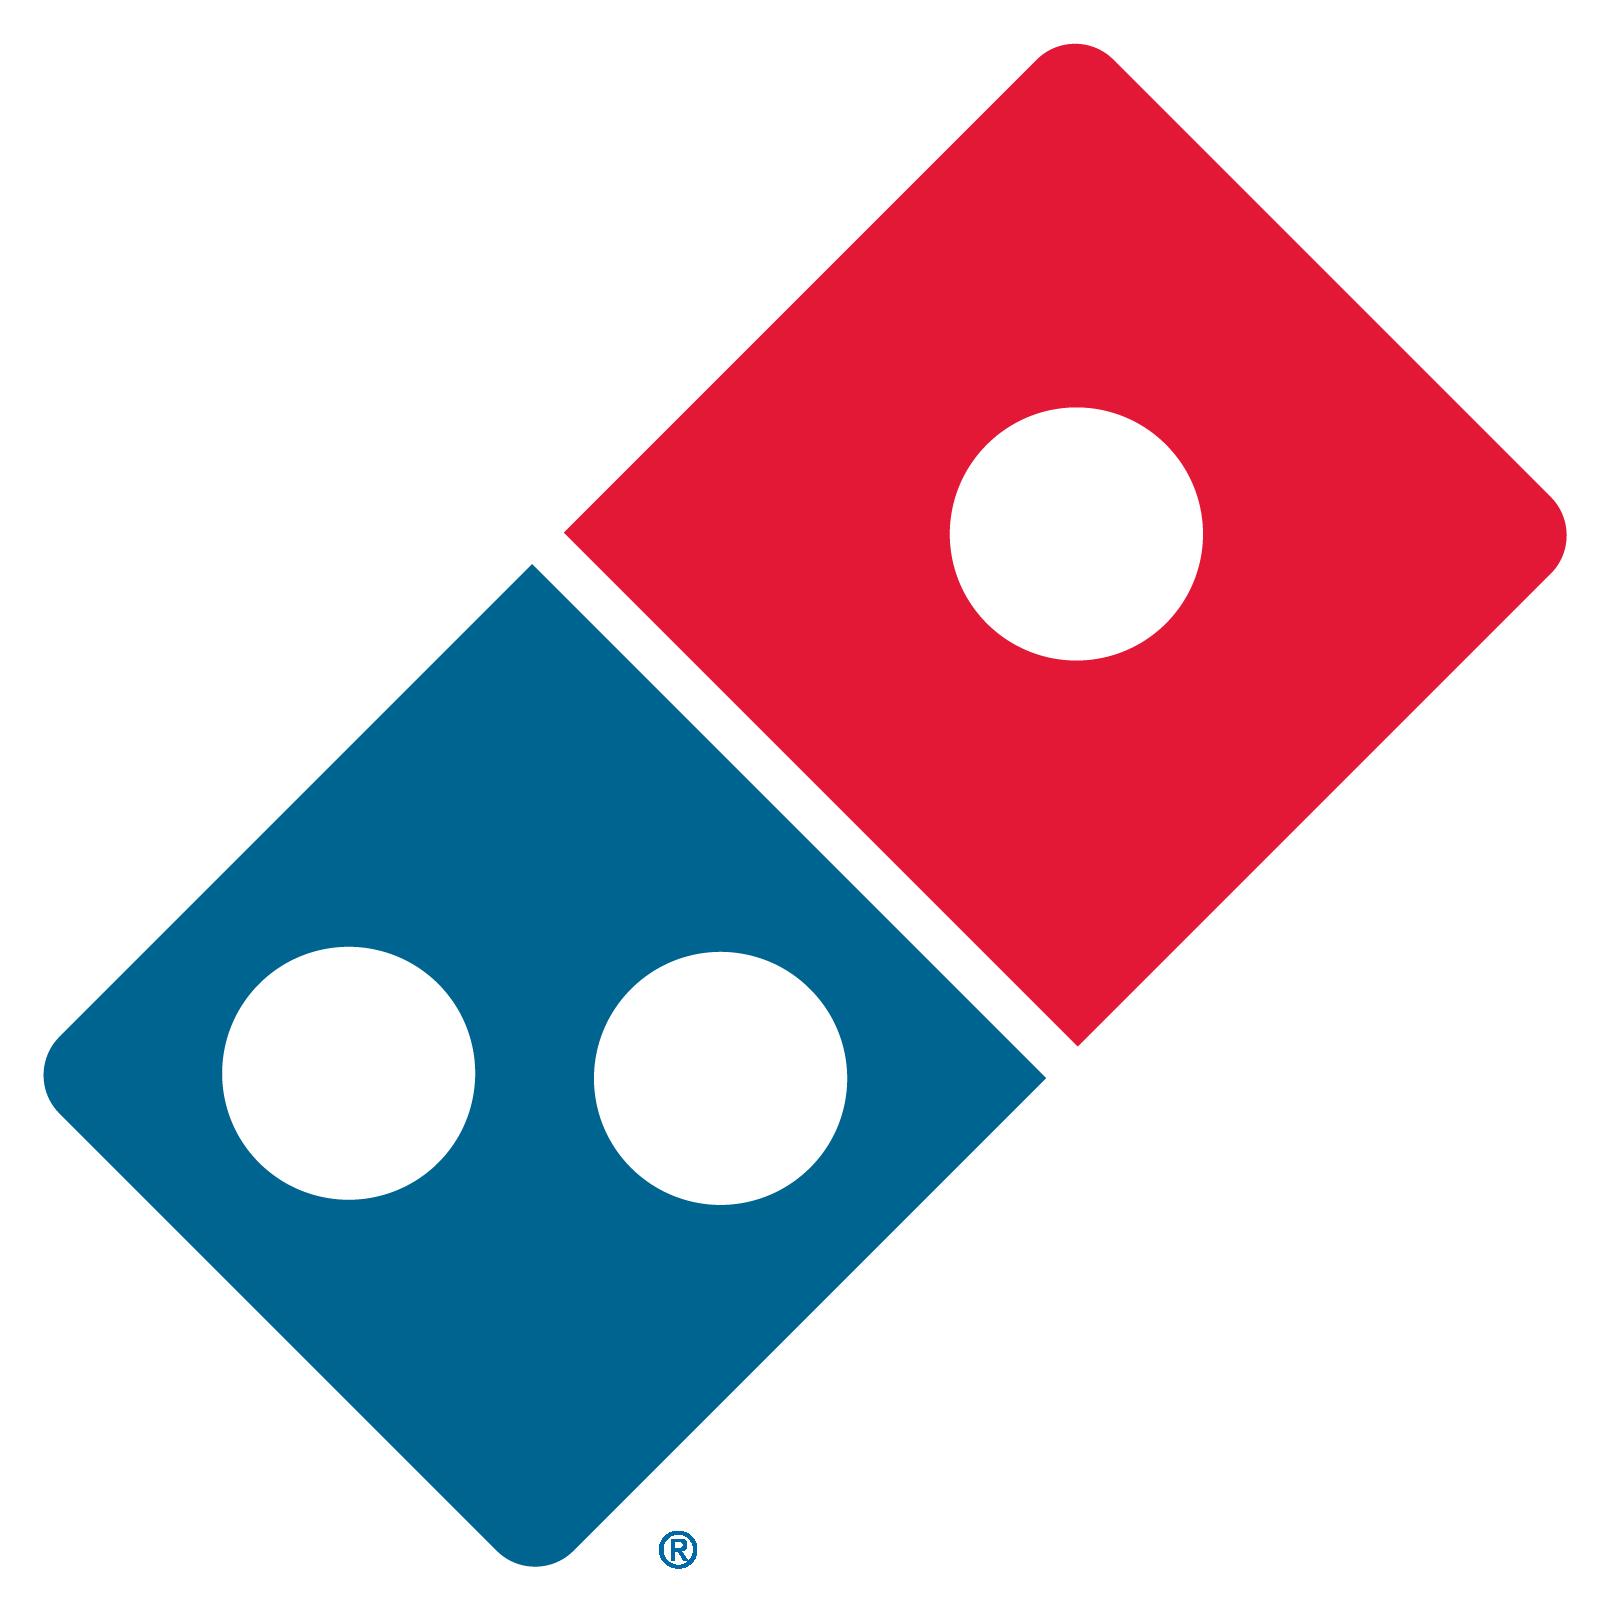 Logo_Blue-Type_Transparent-BG.png